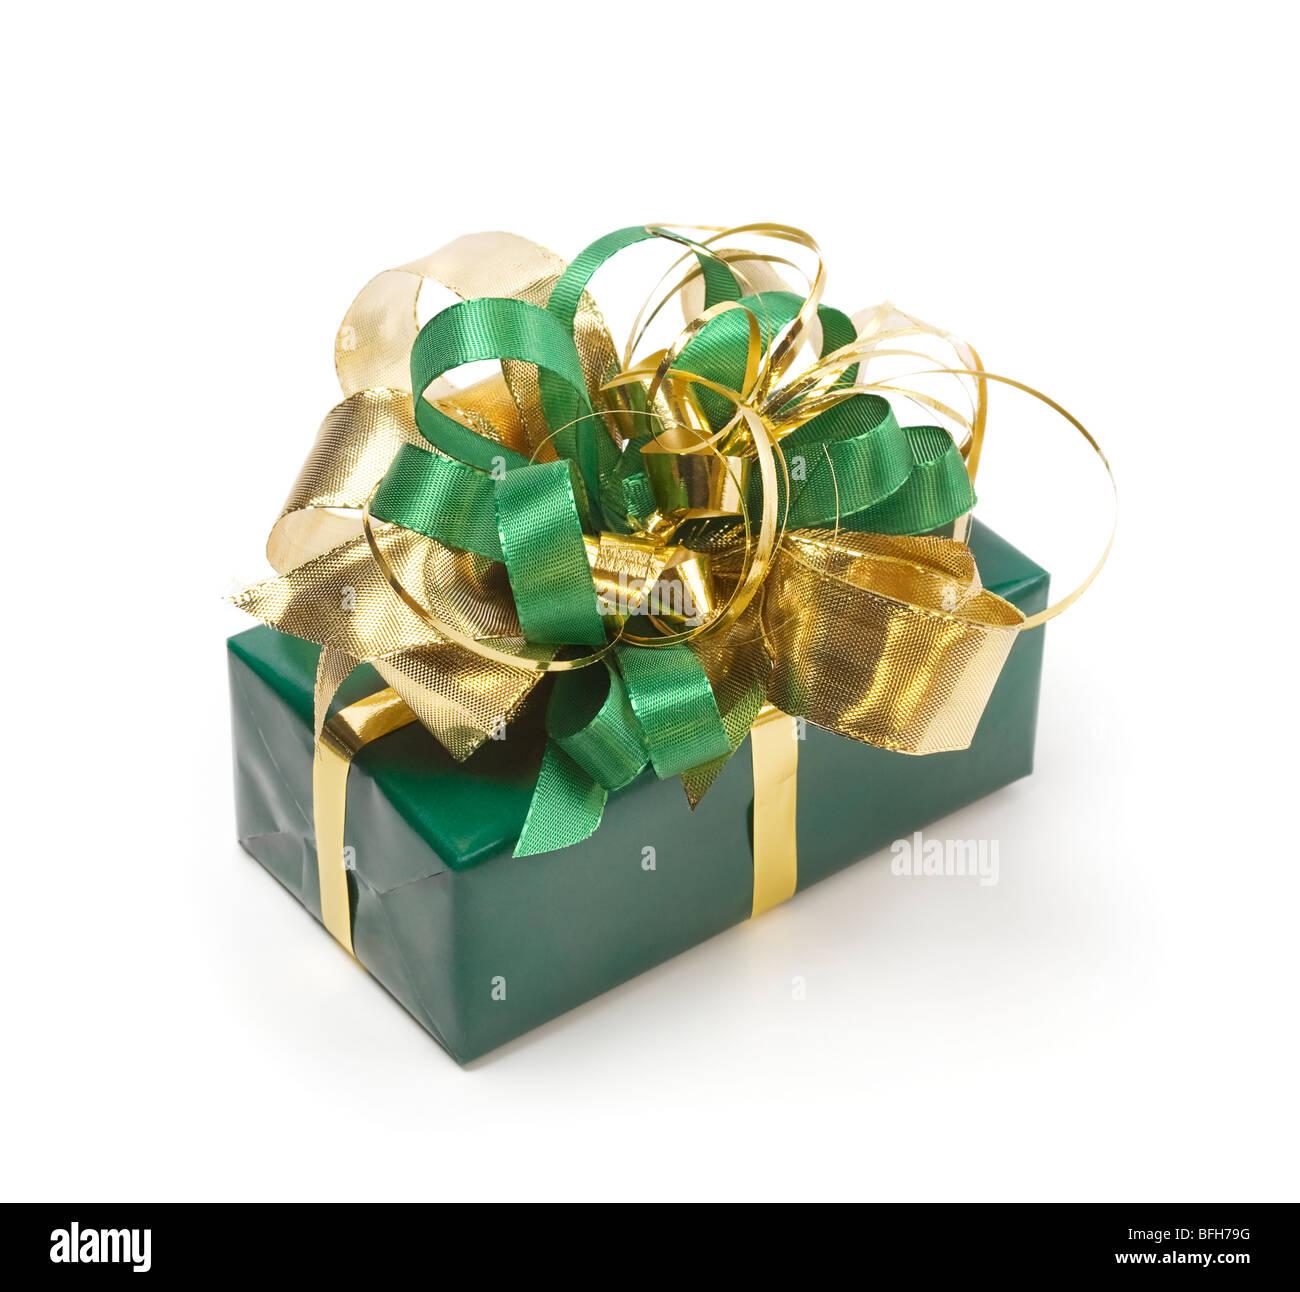 Présent vert avec rubans vert et or Photo Stock